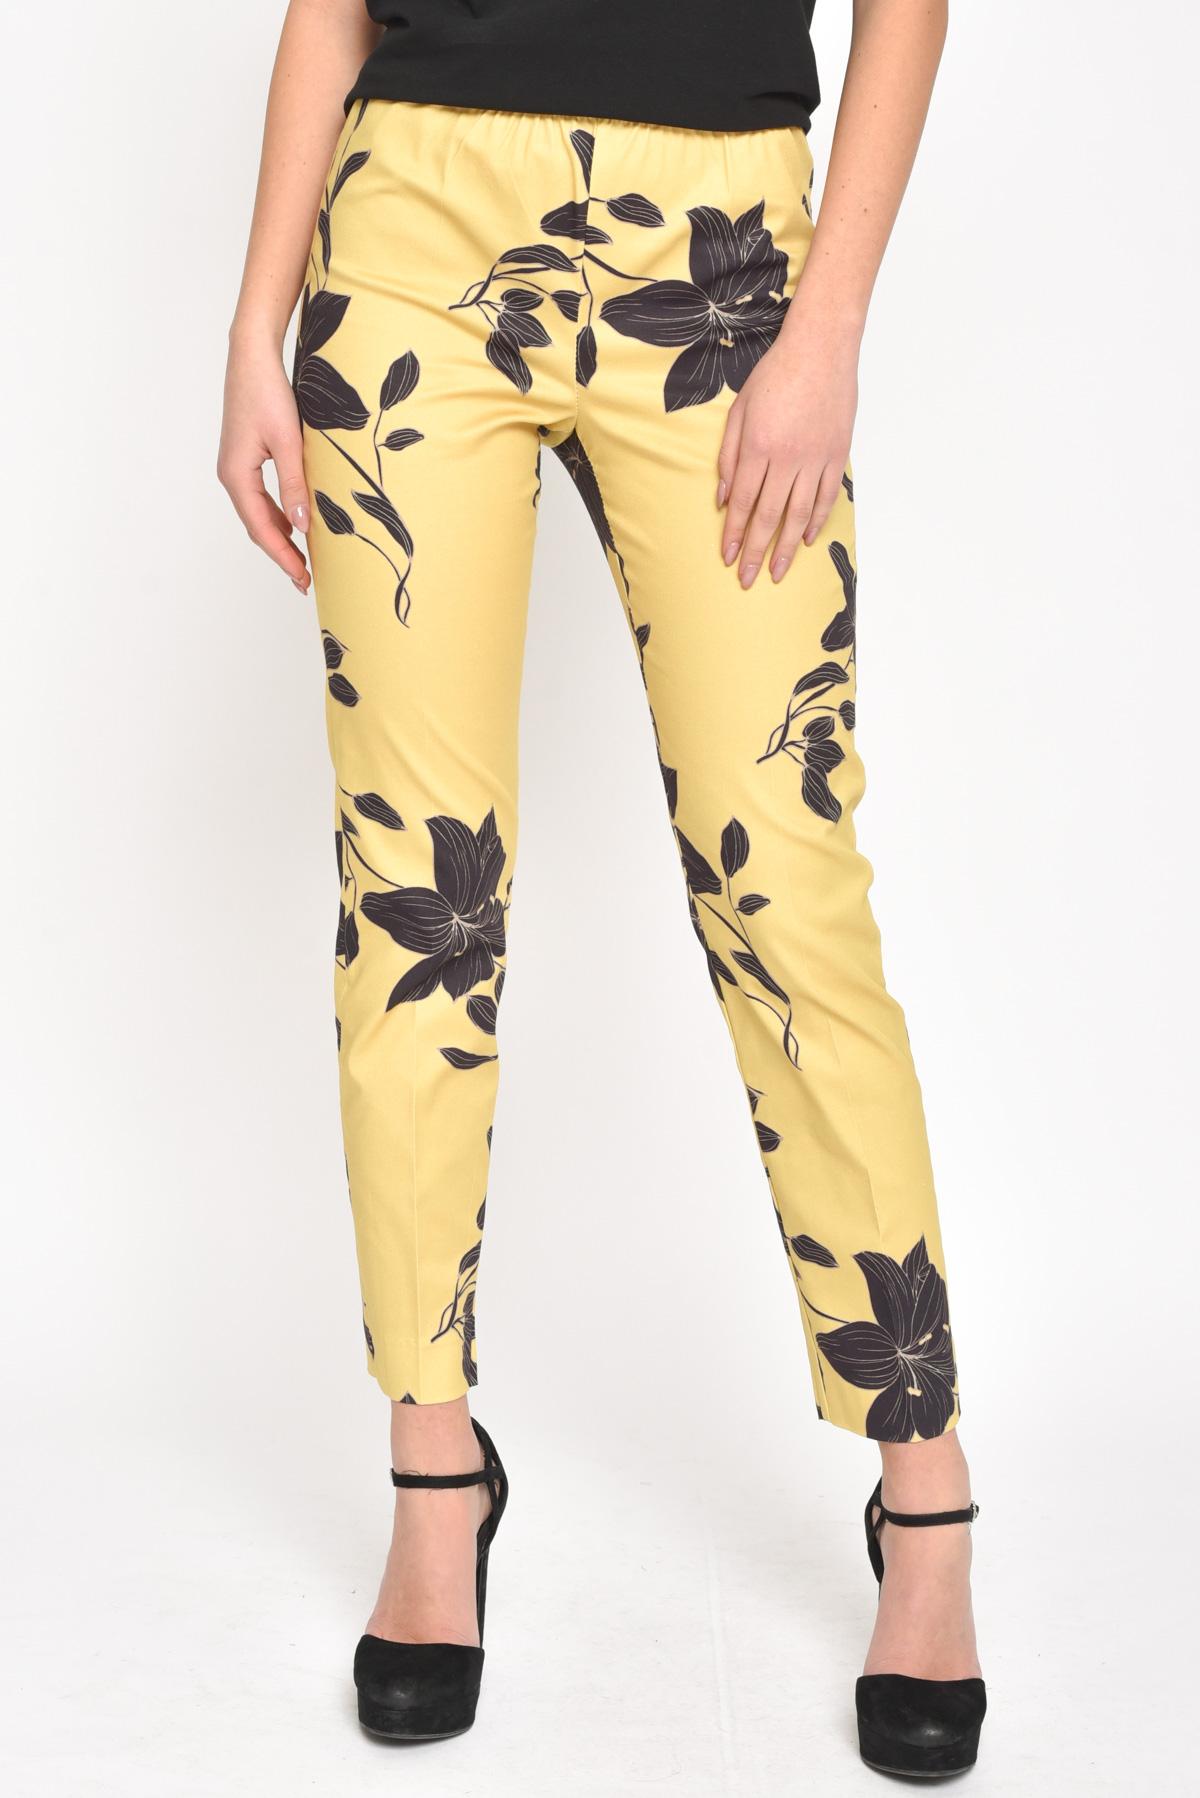 PANTALONI FLOWERS A CONTRASTO for women - MUSTARD - Paquito Pronto Moda Shop Online